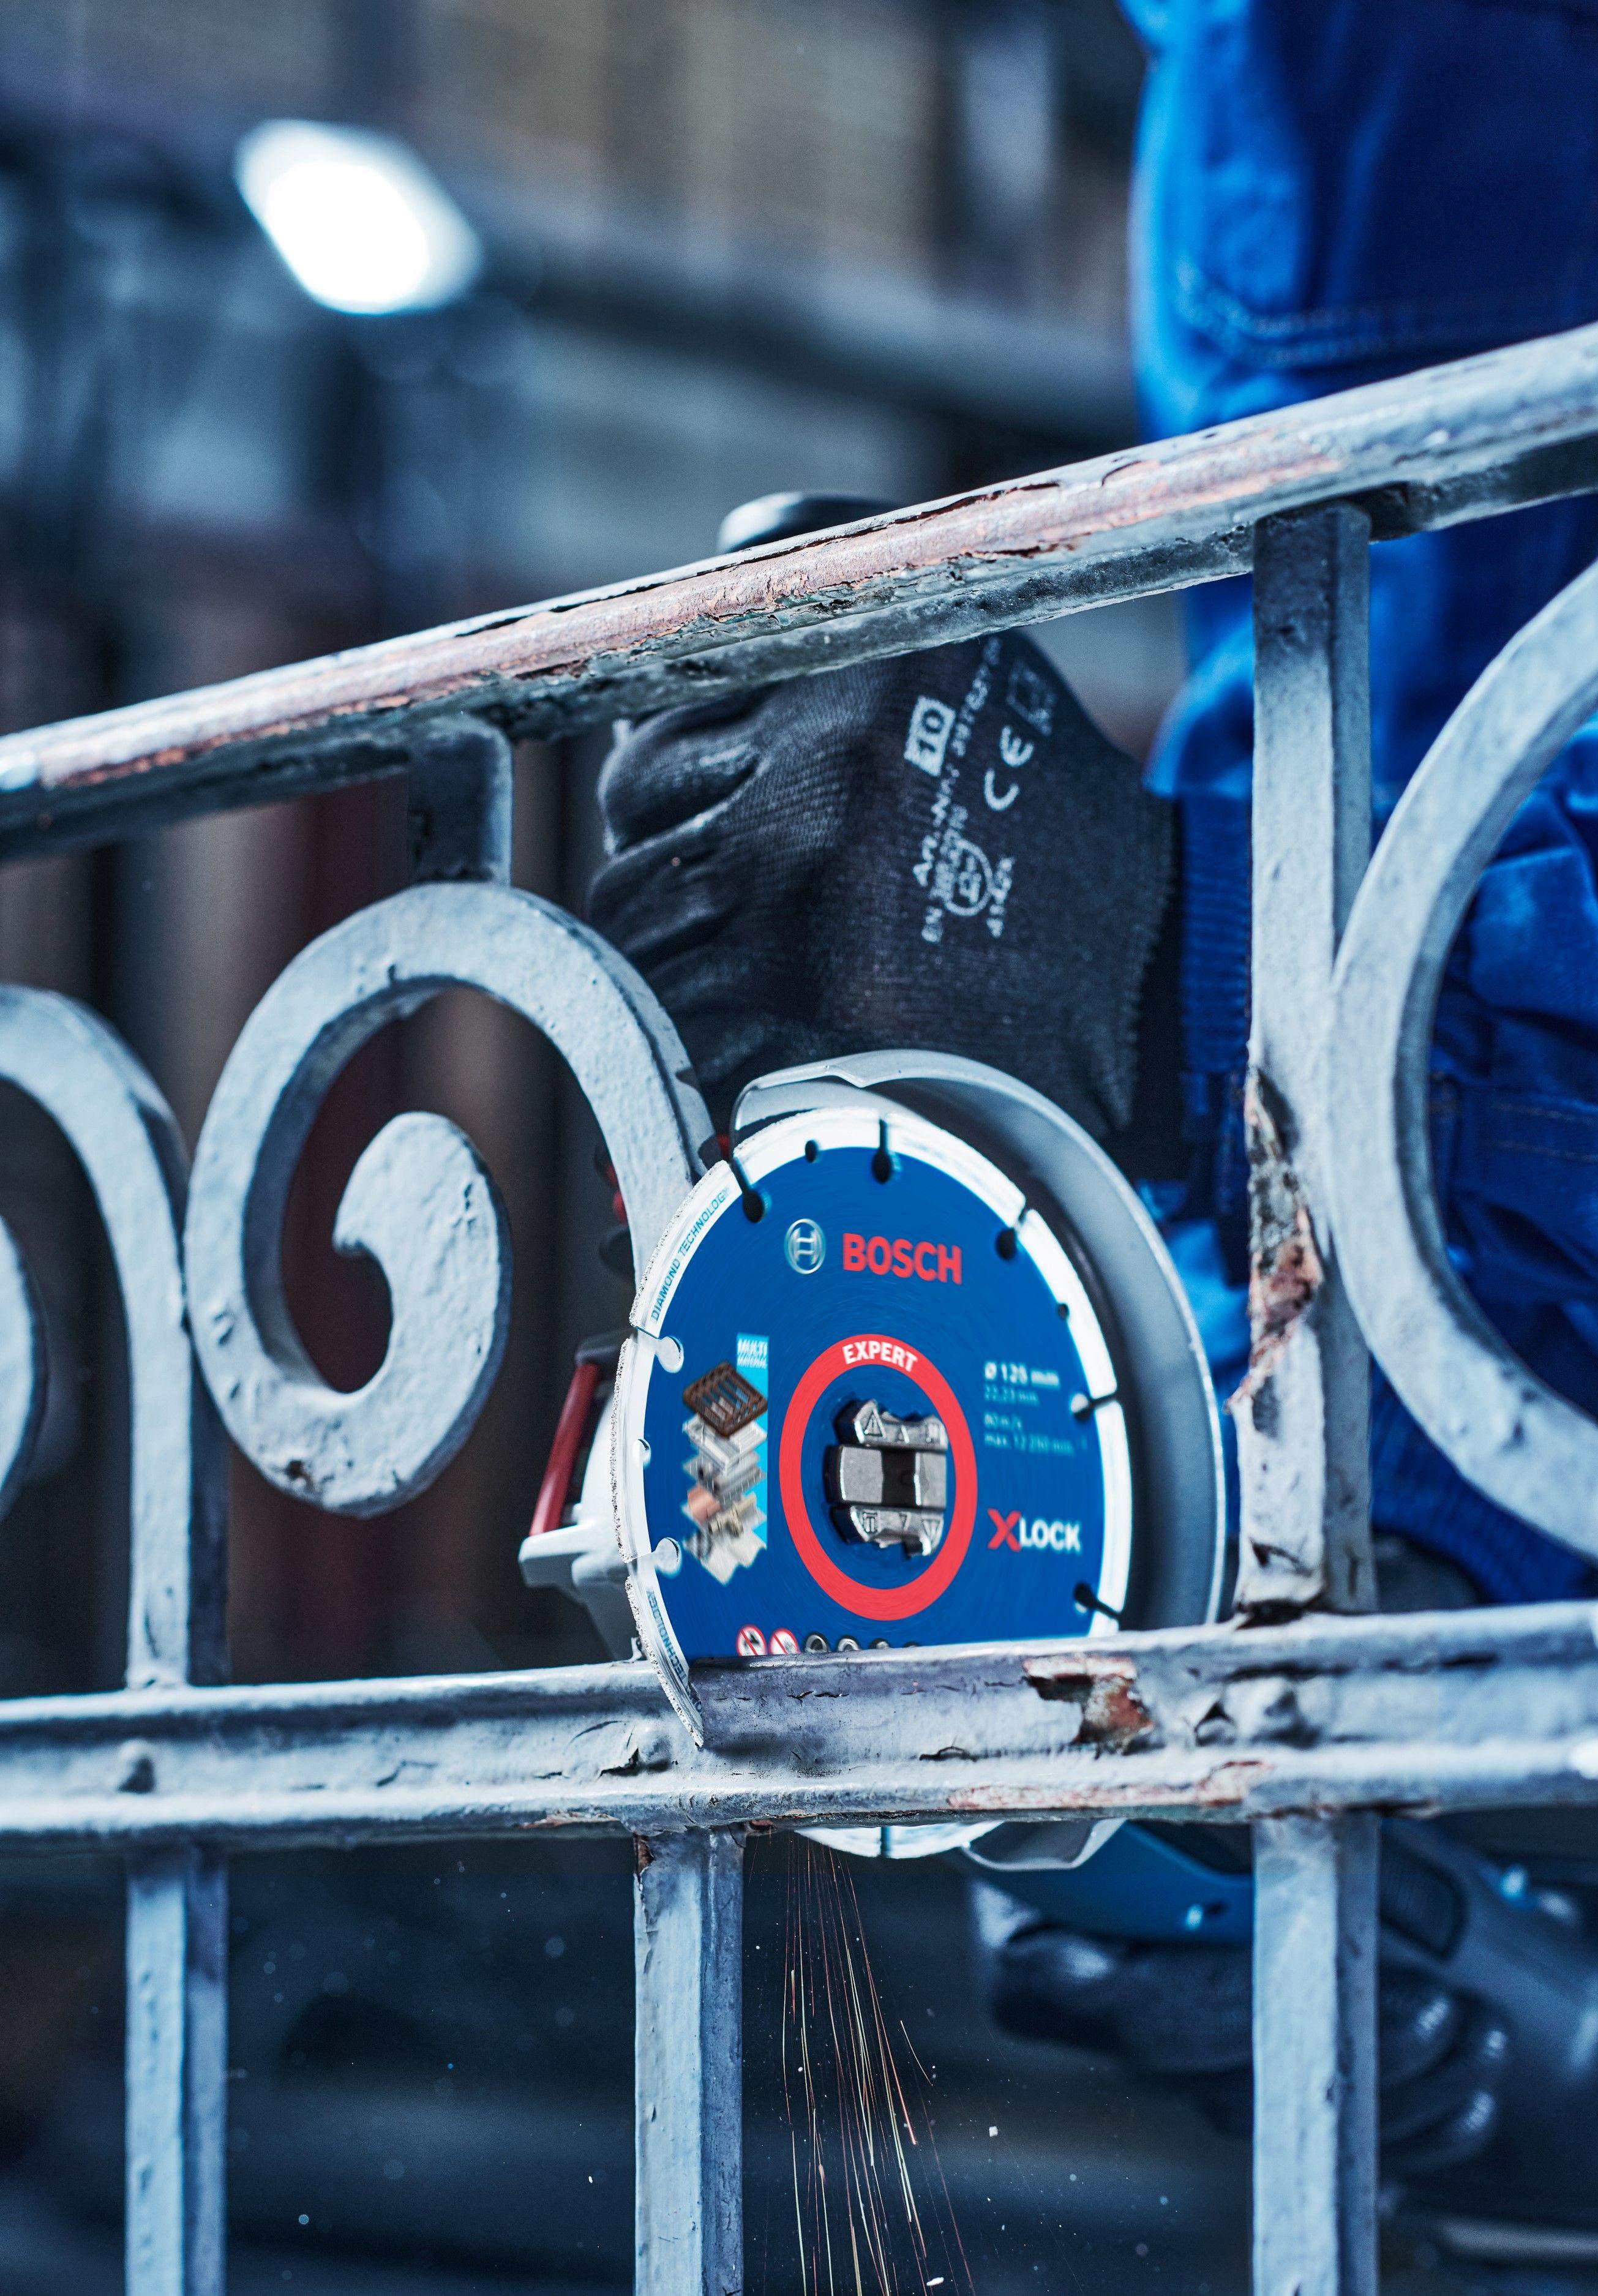 Expert Diamond Metal Wheel X-LOCK Cutting Discs